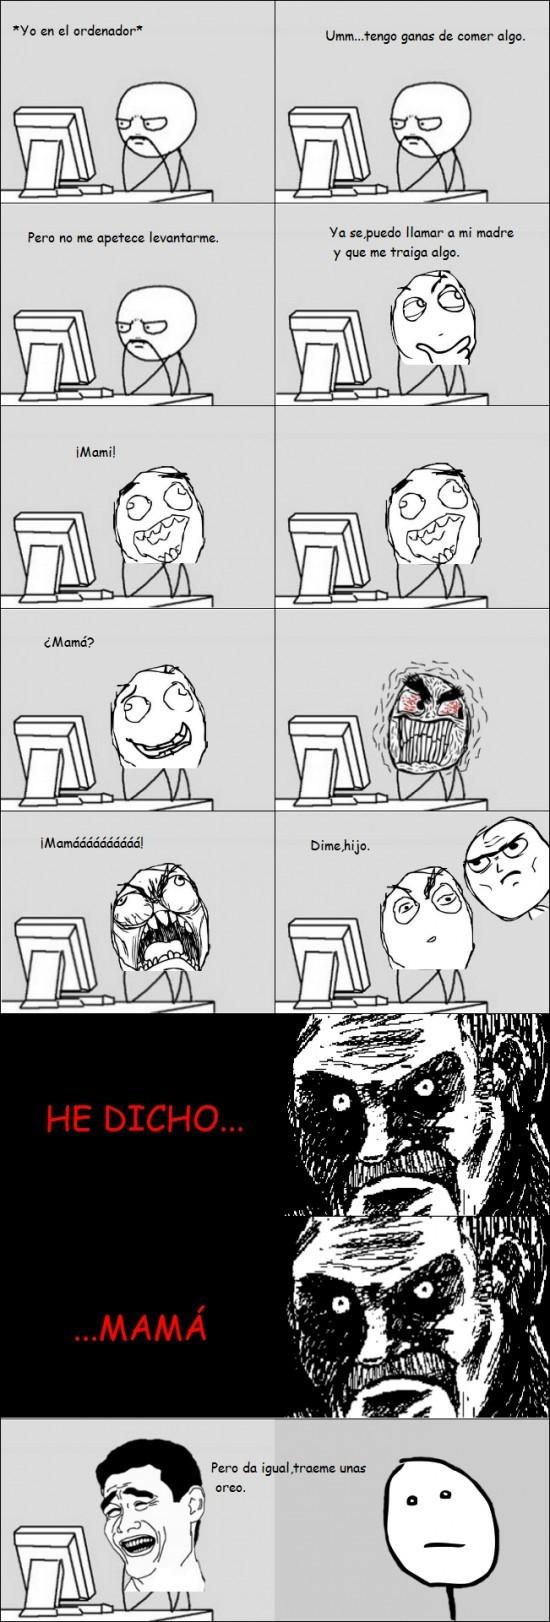 Madre,ordenador,oreo,padre,yo